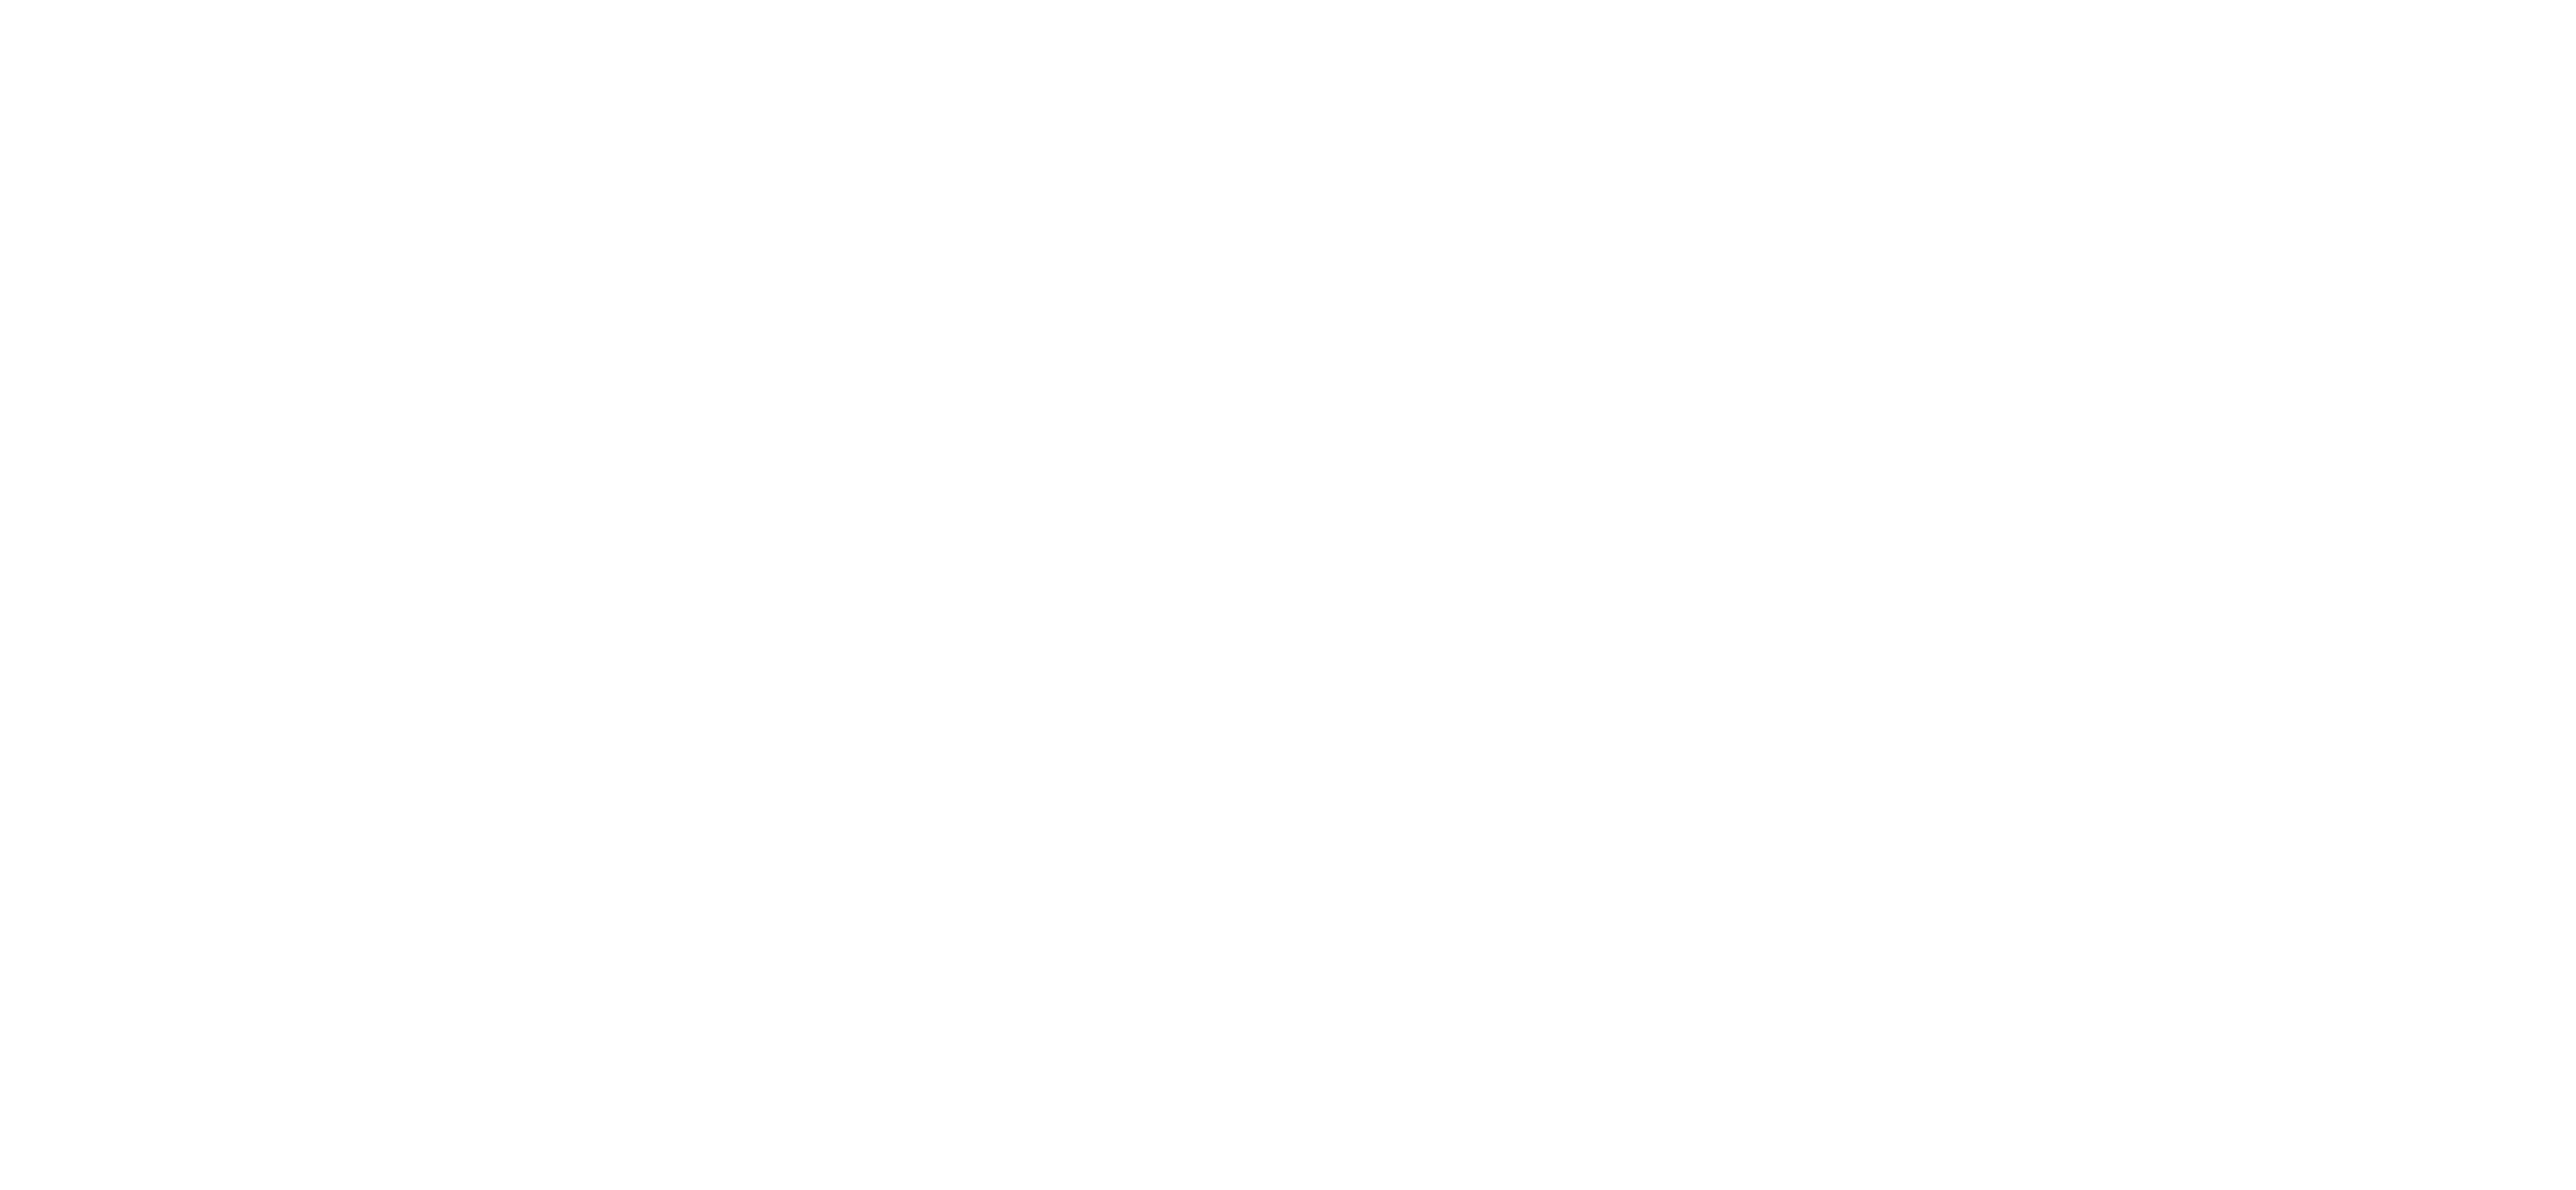 De Liberale Wereld